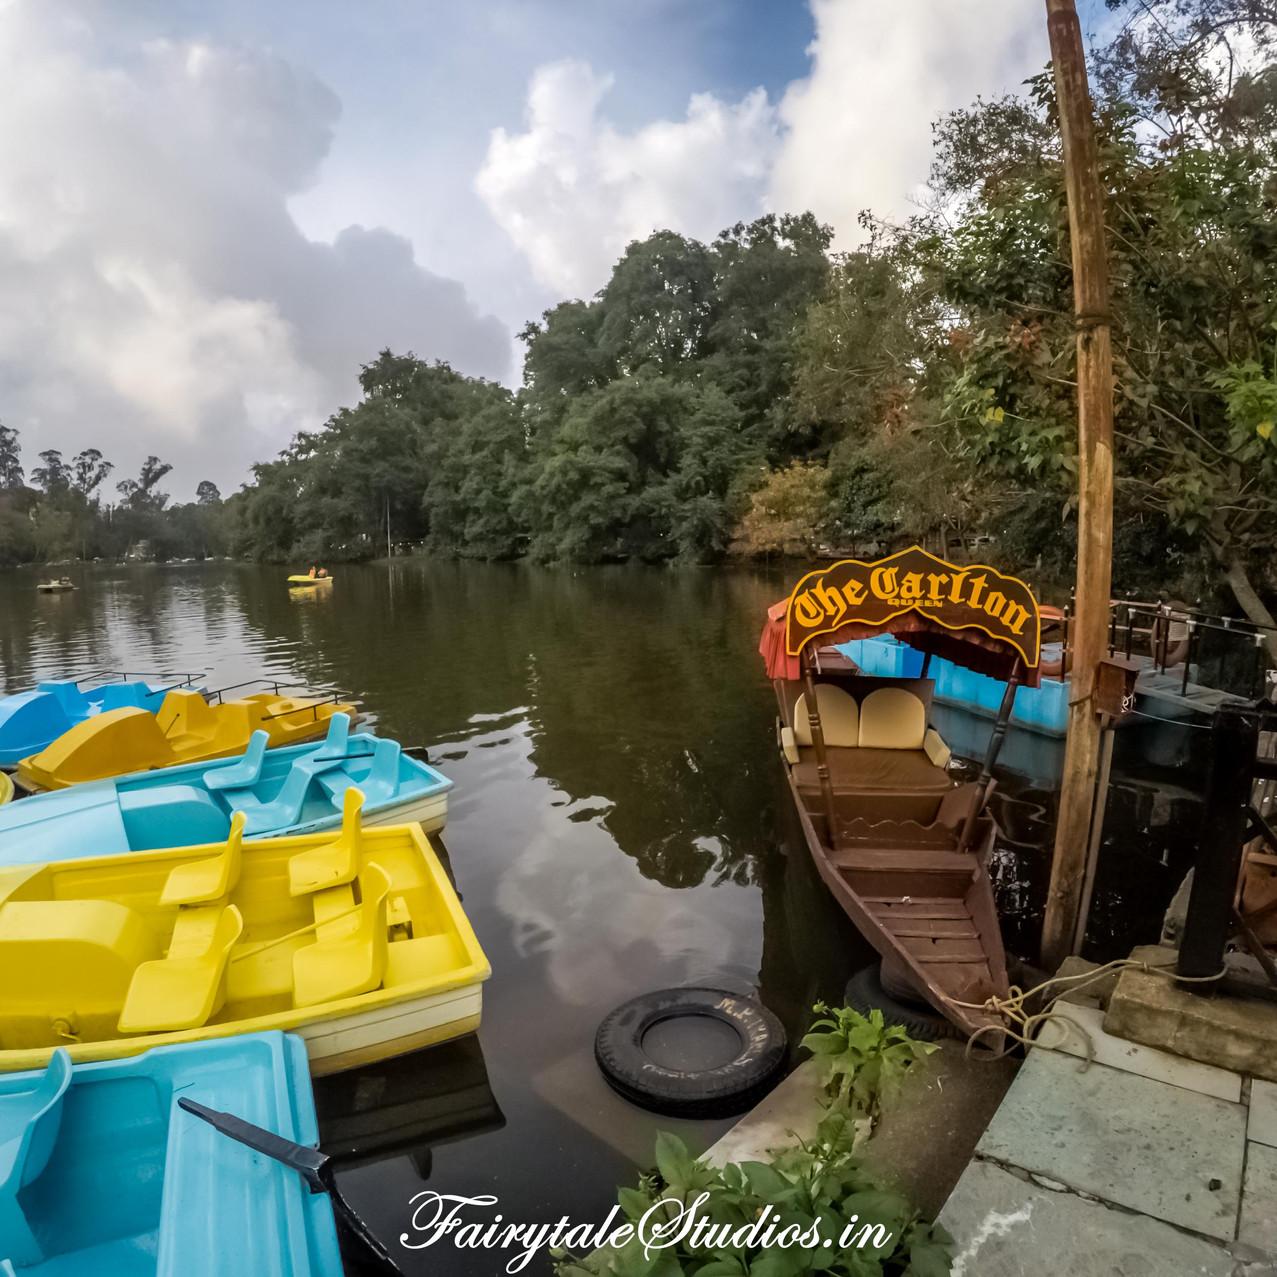 Boating_The Carlton Kodaikanal_Fairytale Travels (2)